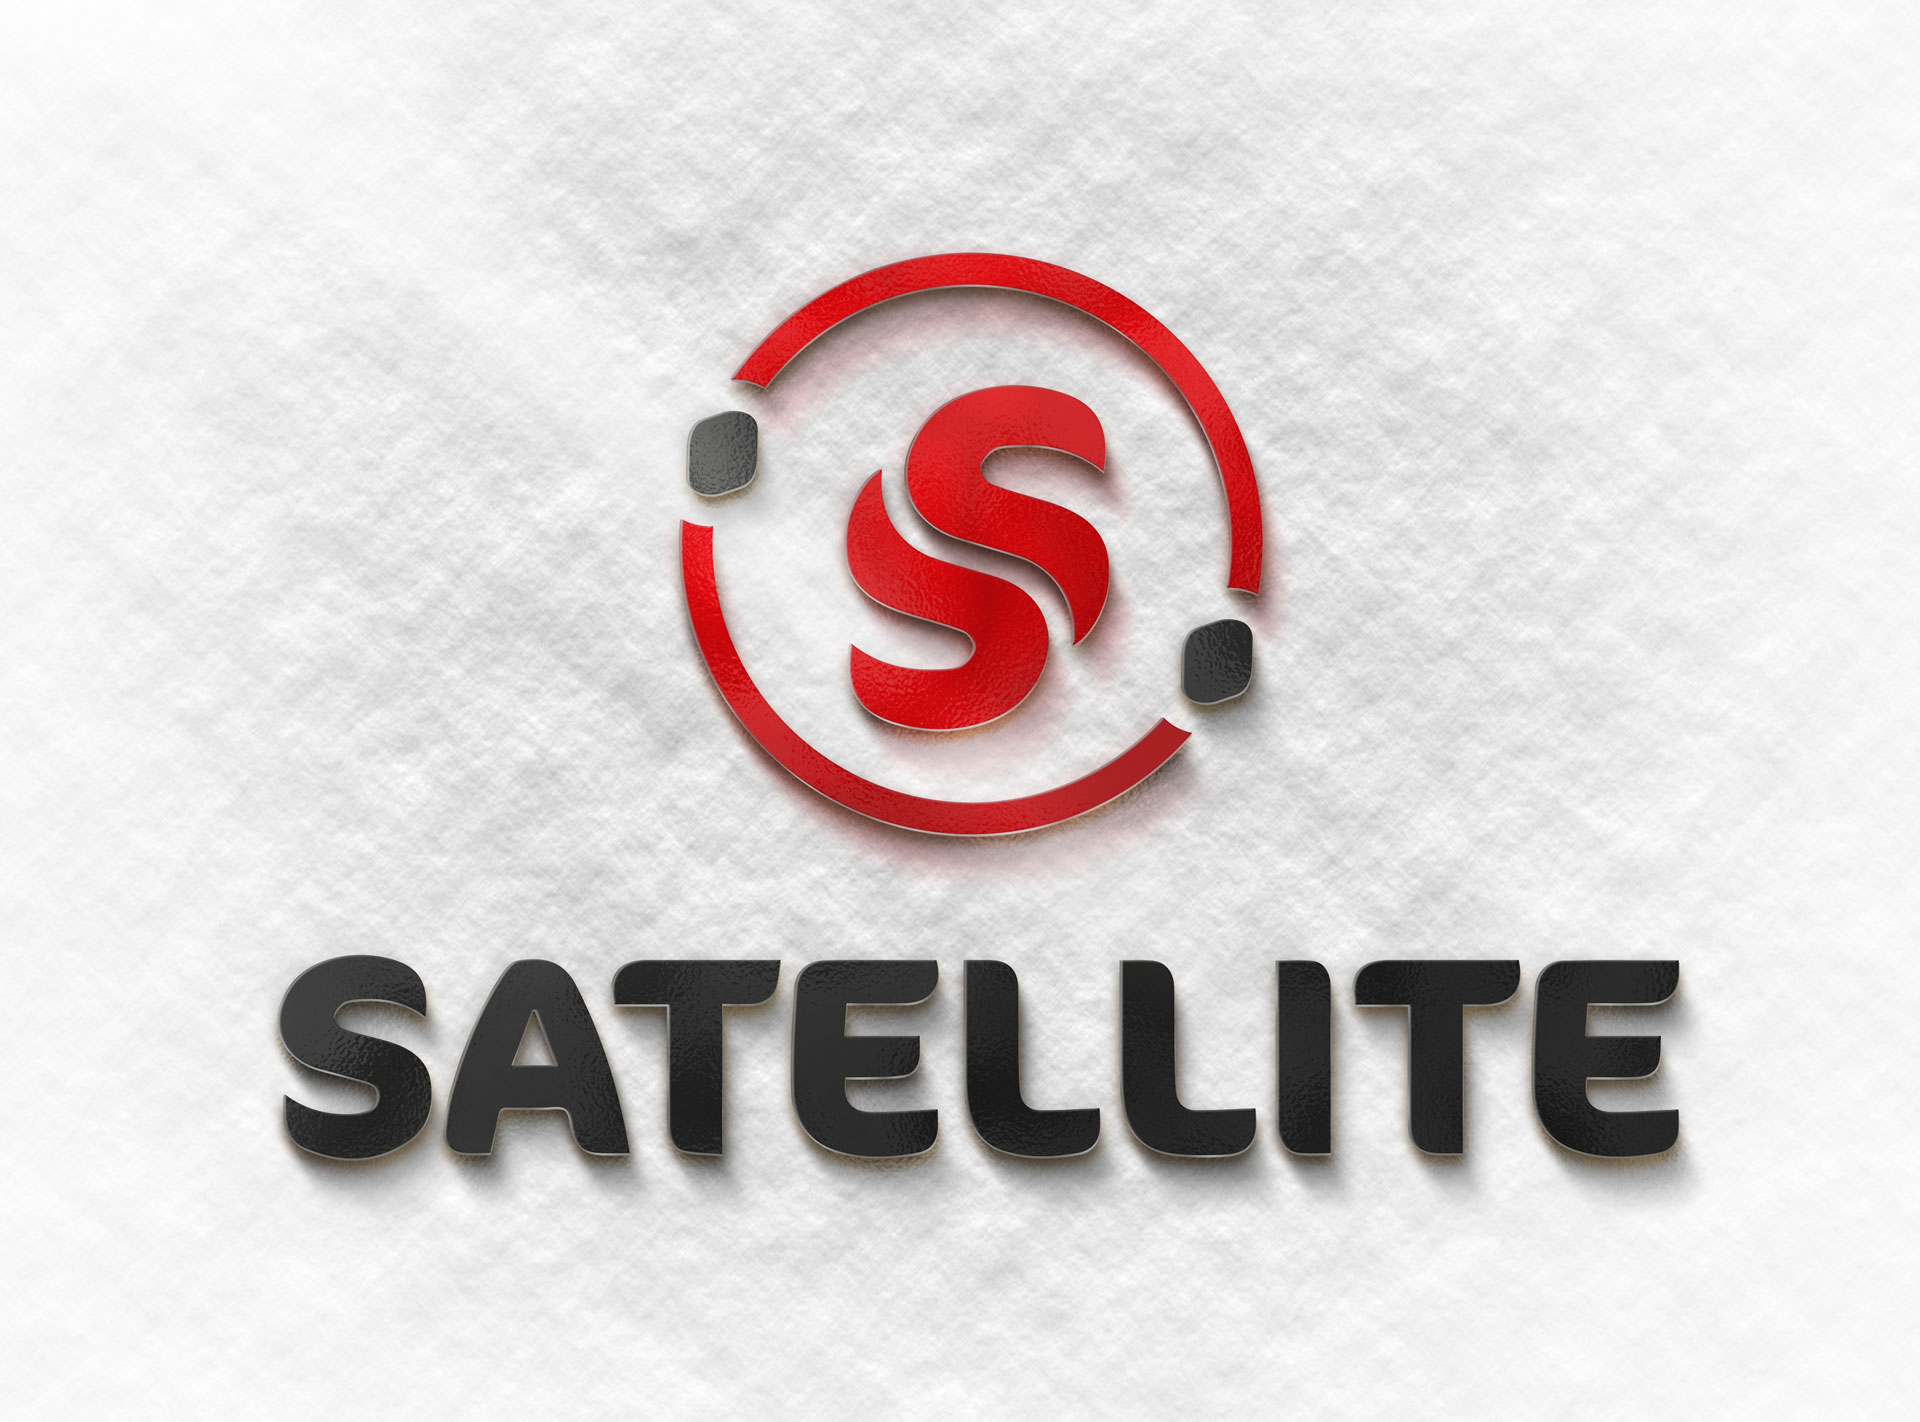 satellite-projekt-logo-dla-firmy